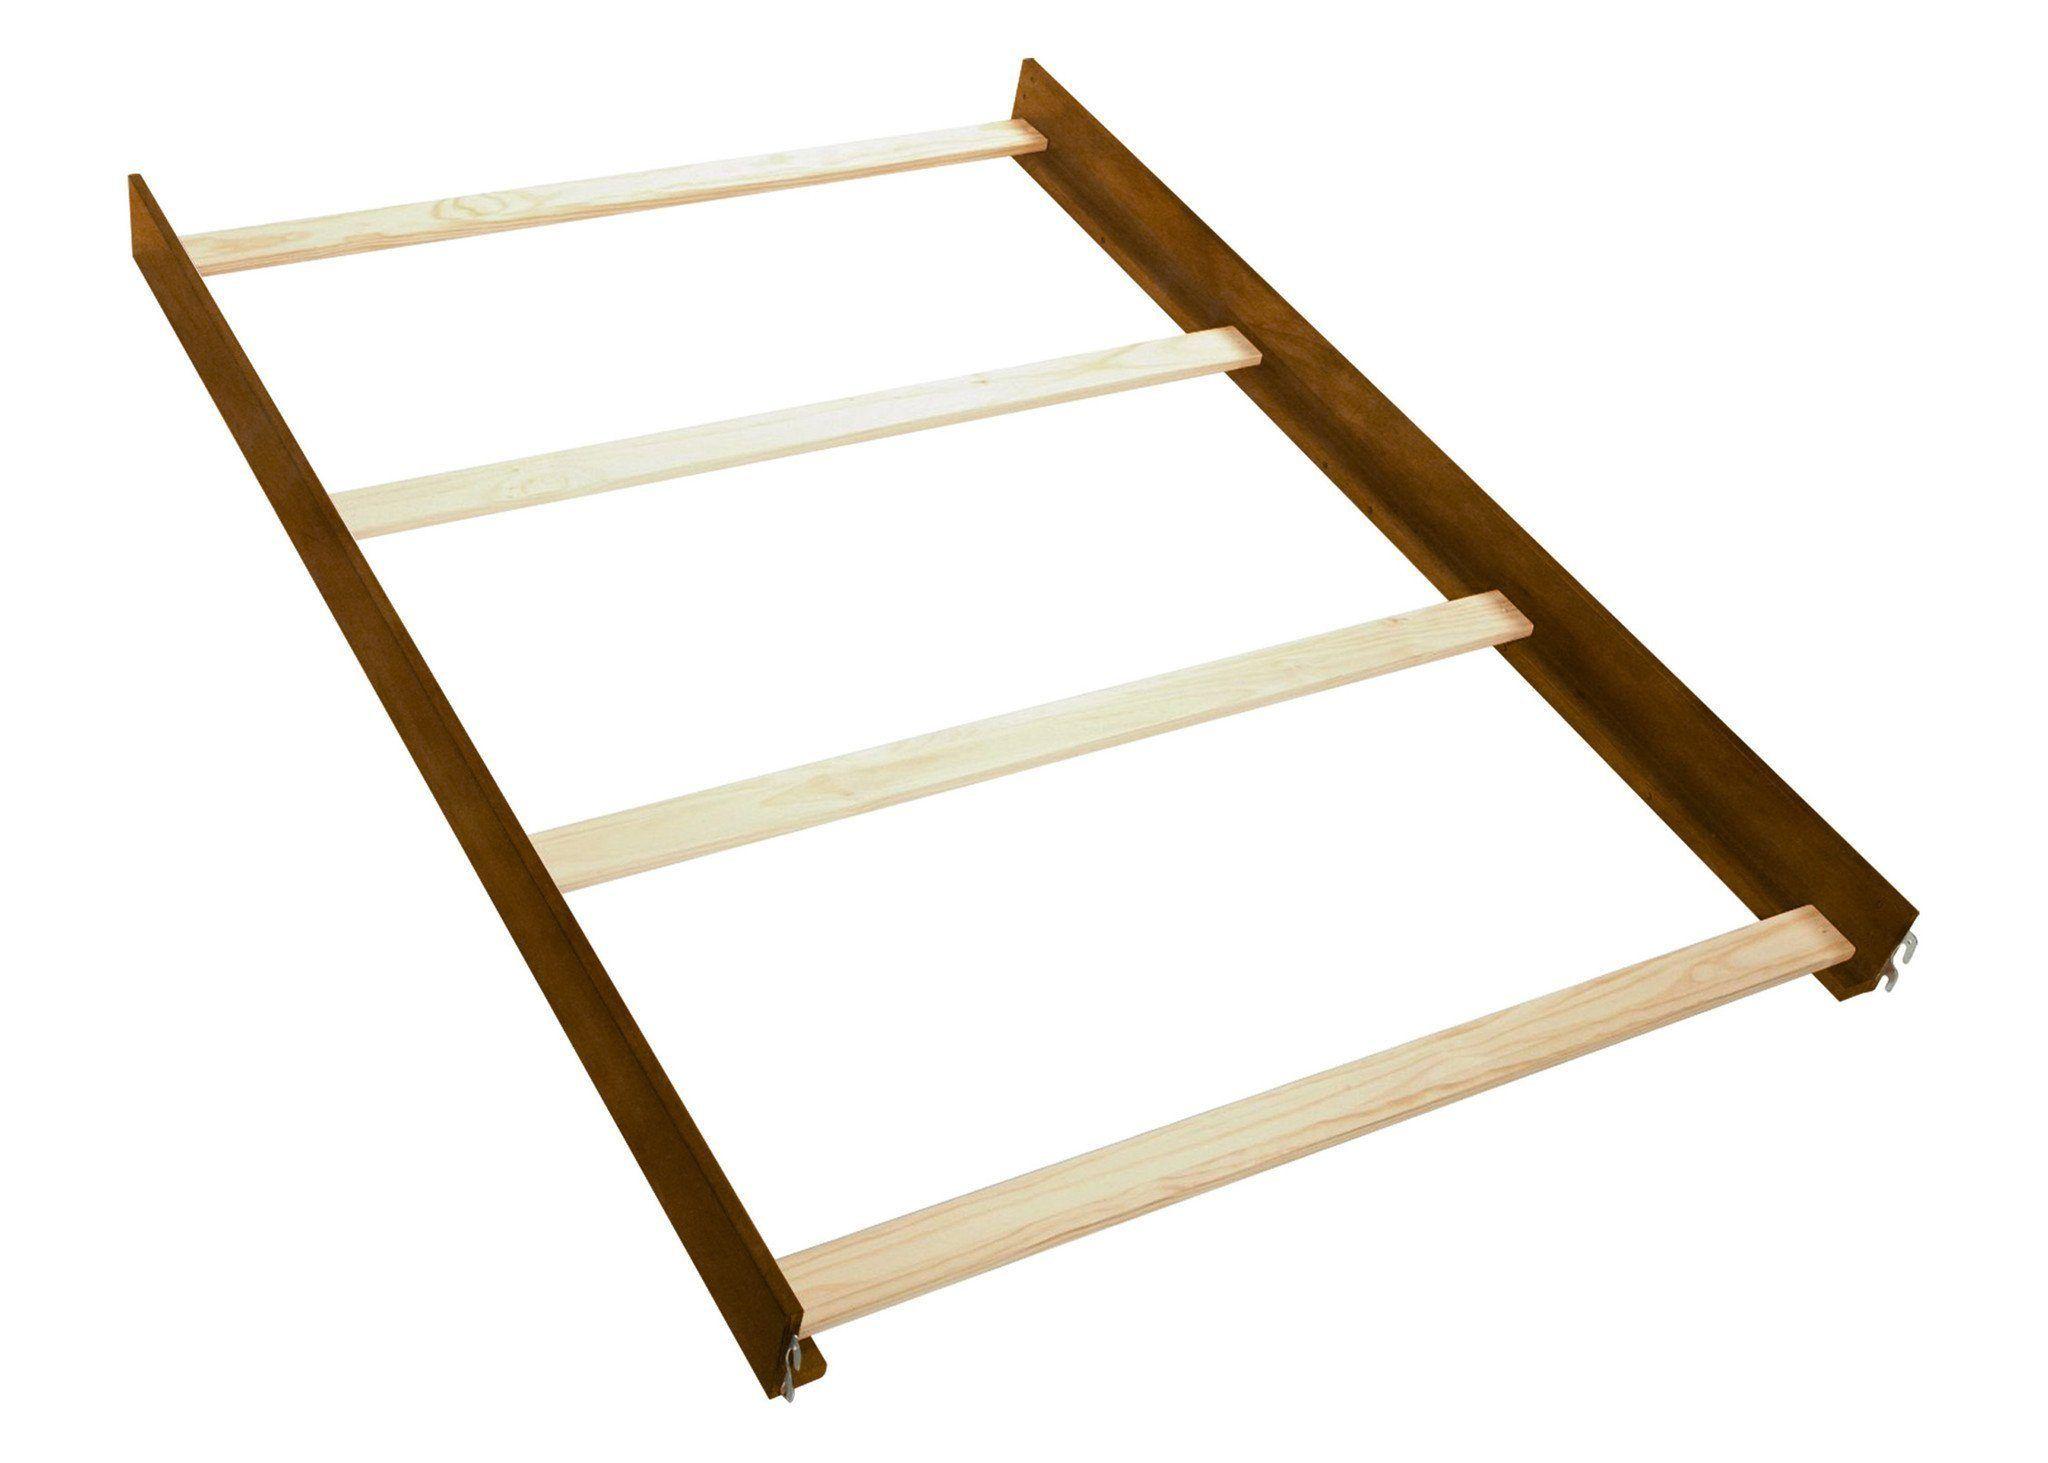 Wood Bed Rails (180080) Wood beds, Bed rails, Full size